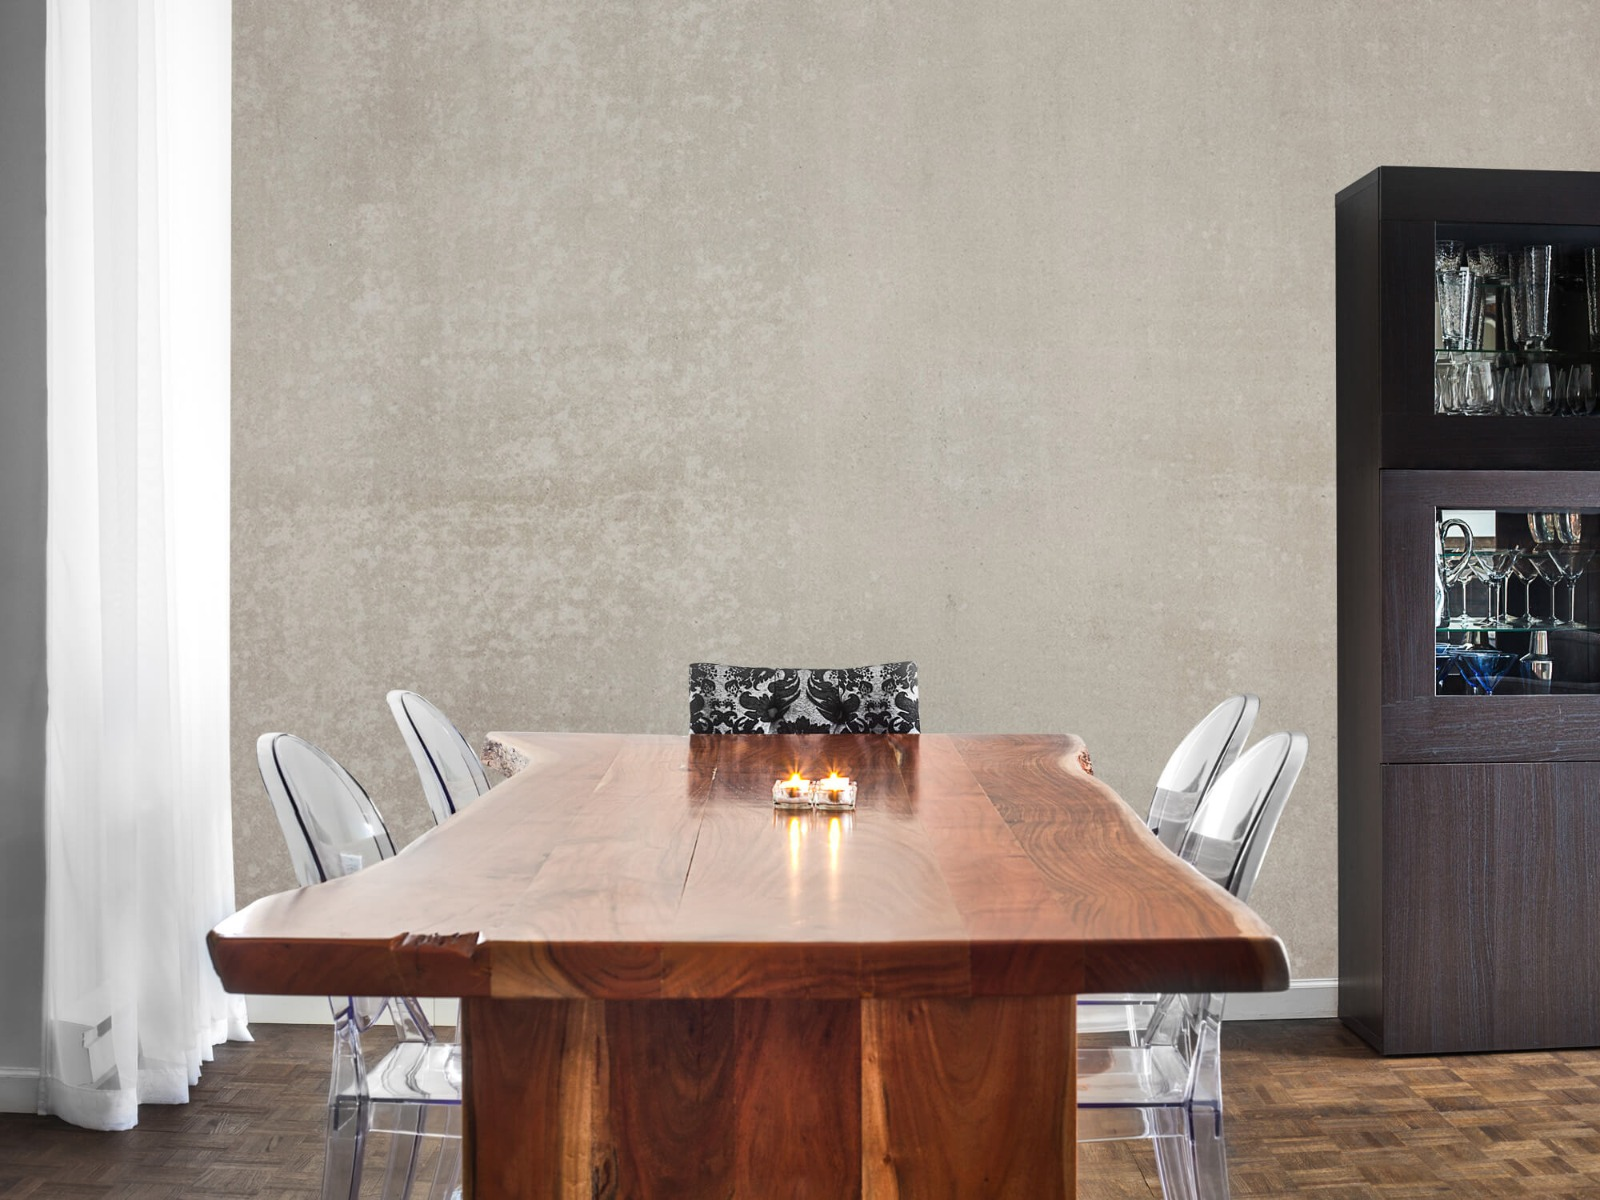 Betonlook behang - Taupe beton - Wallexclusive - Woonkamer 5